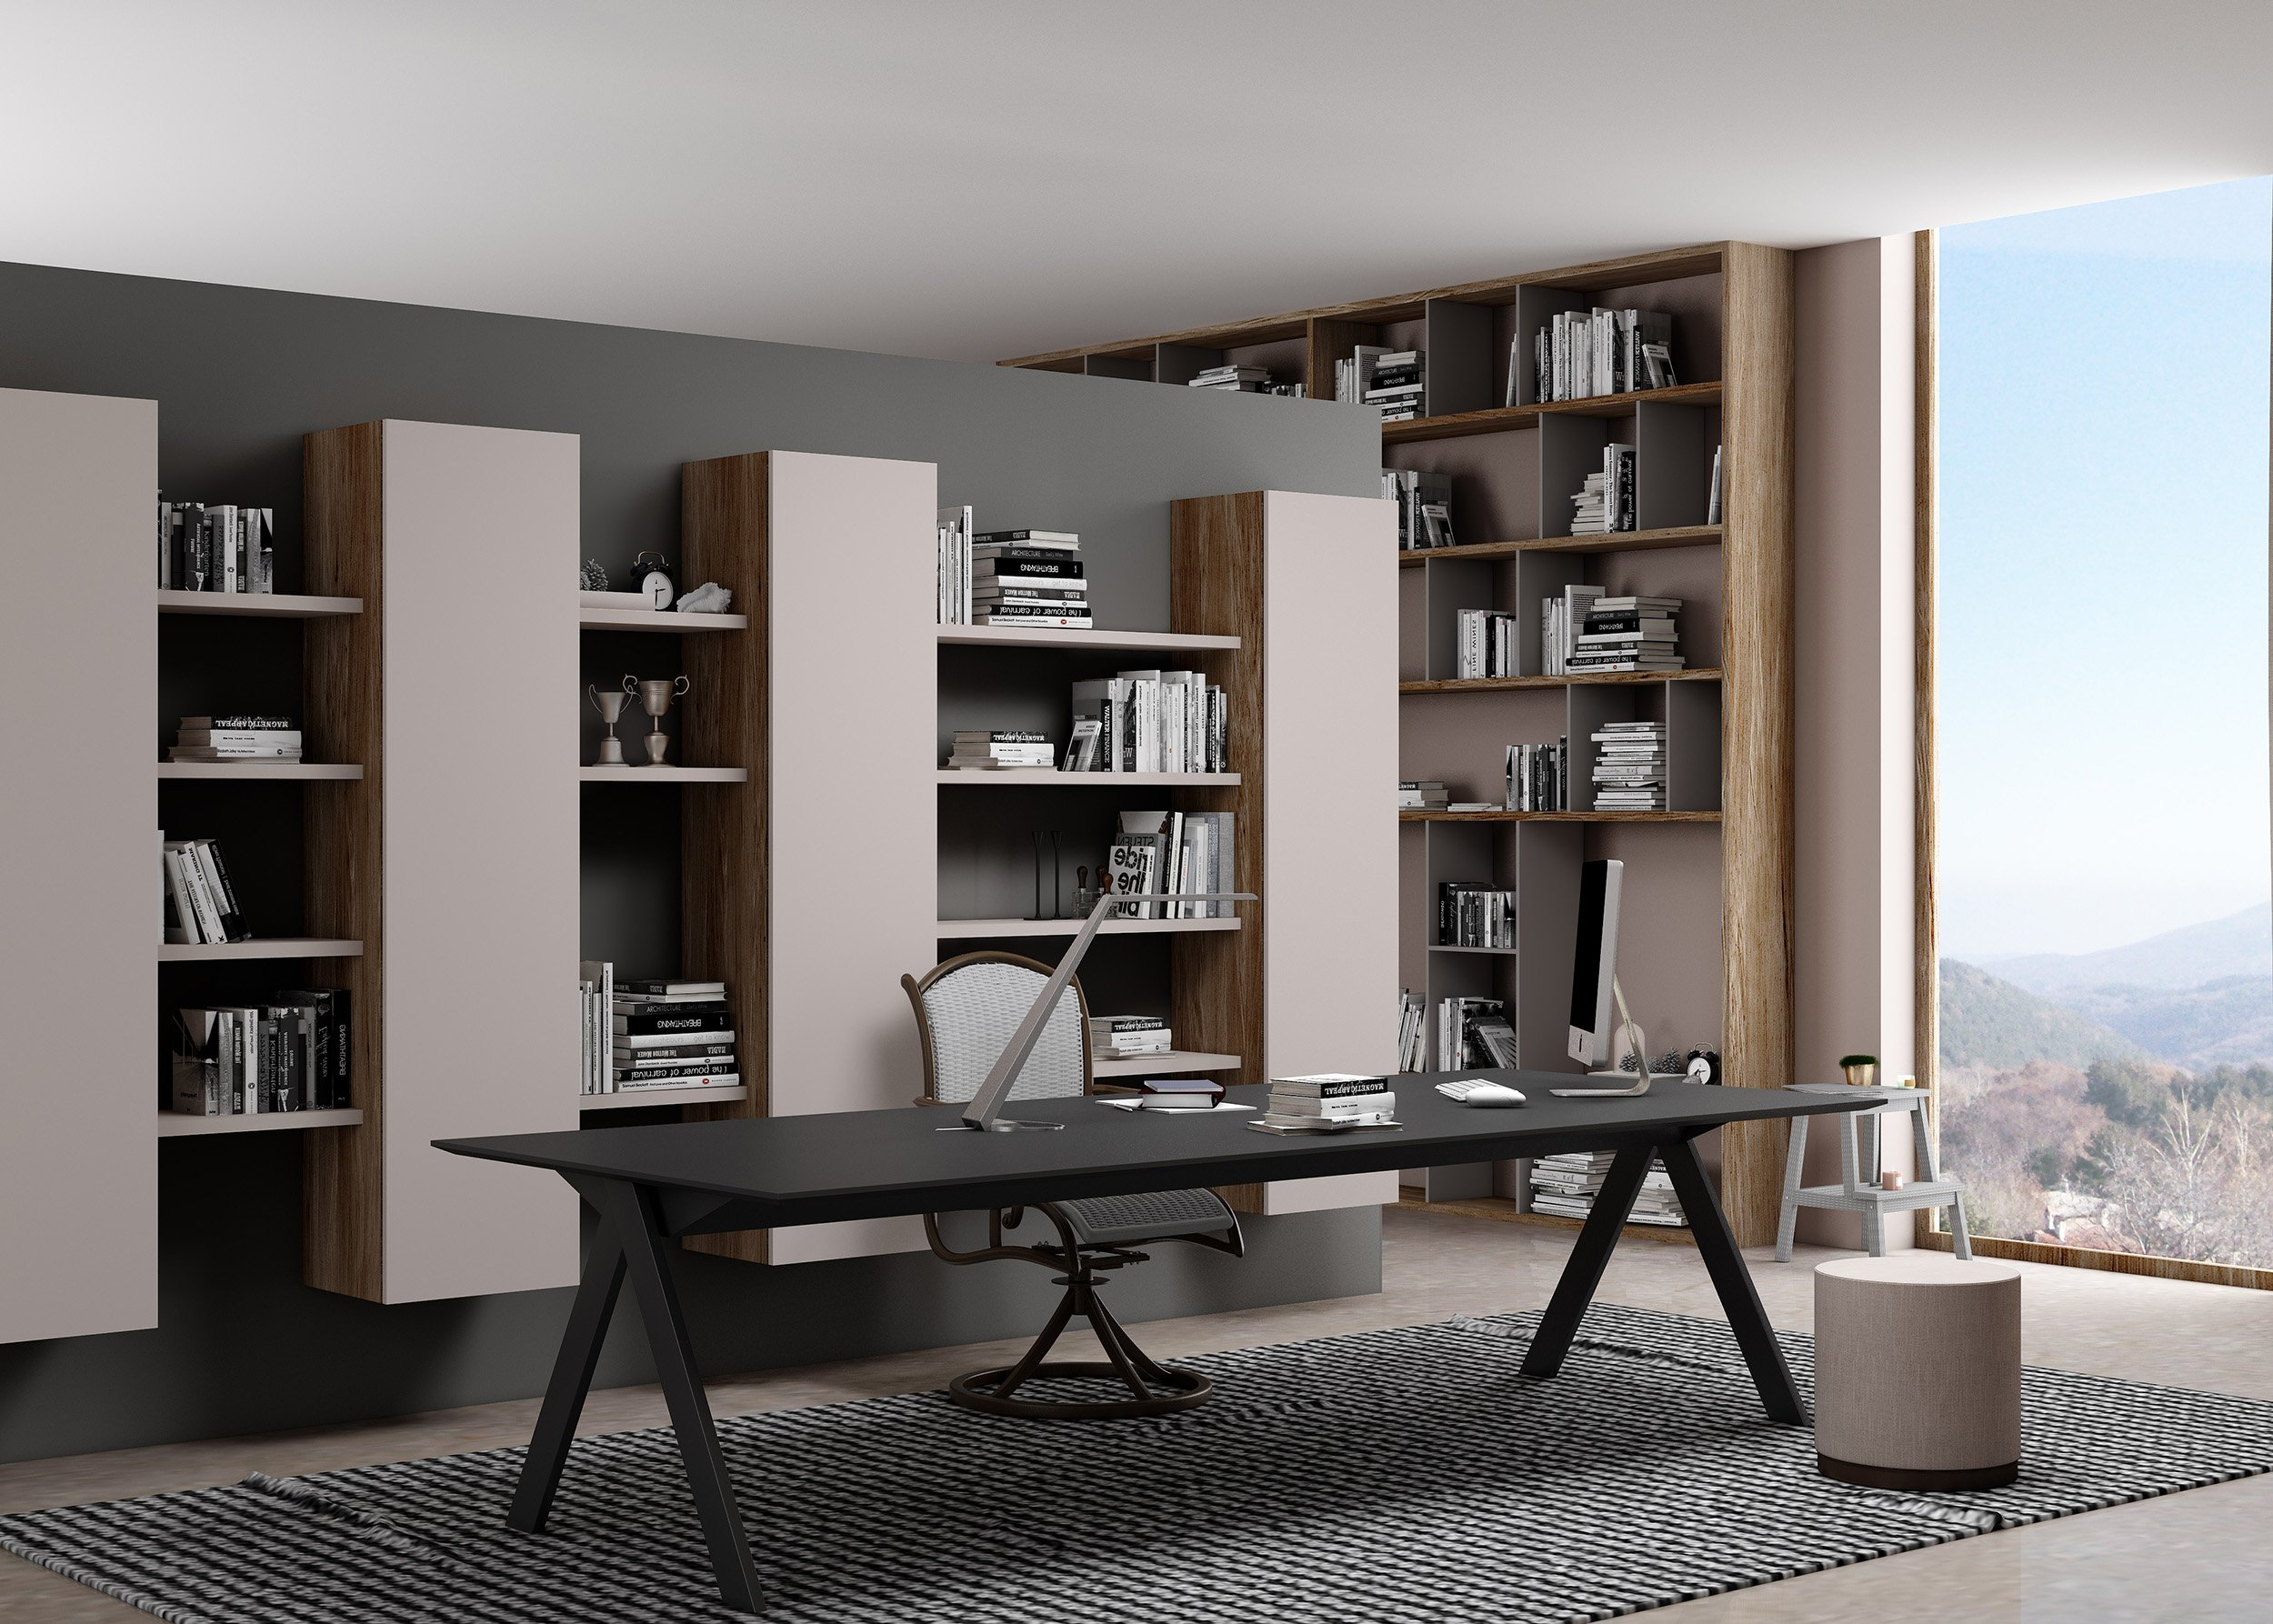 Studies and Libraries